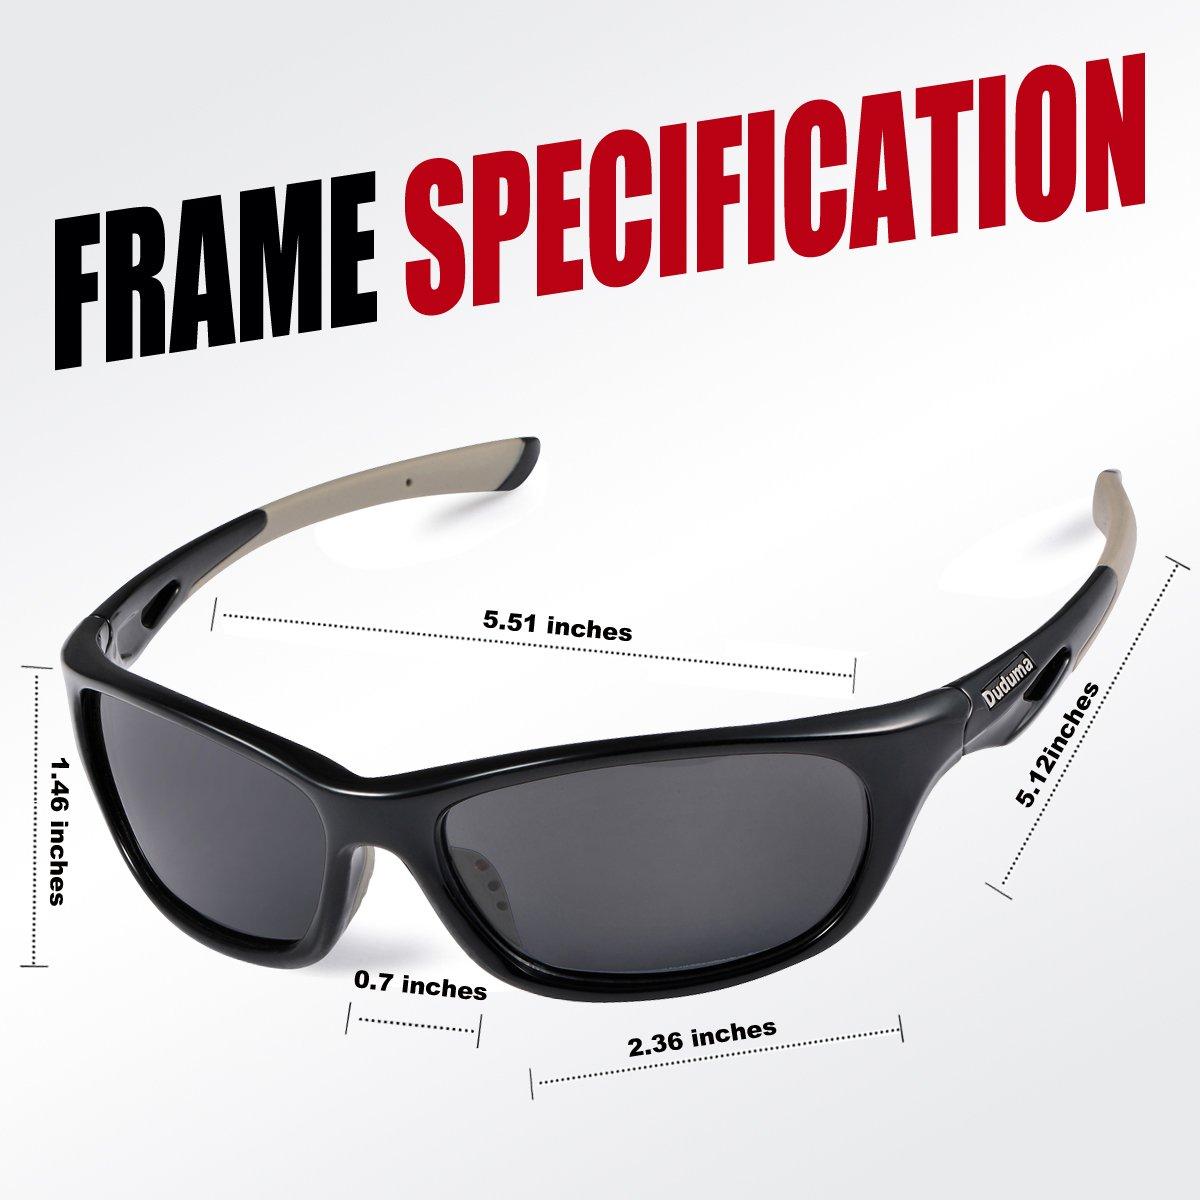 a07483edc1 Duduma Polarized Sports Sunglasses for Baseball Running Cycling Fishing Golf  Tr646 Durable Frame